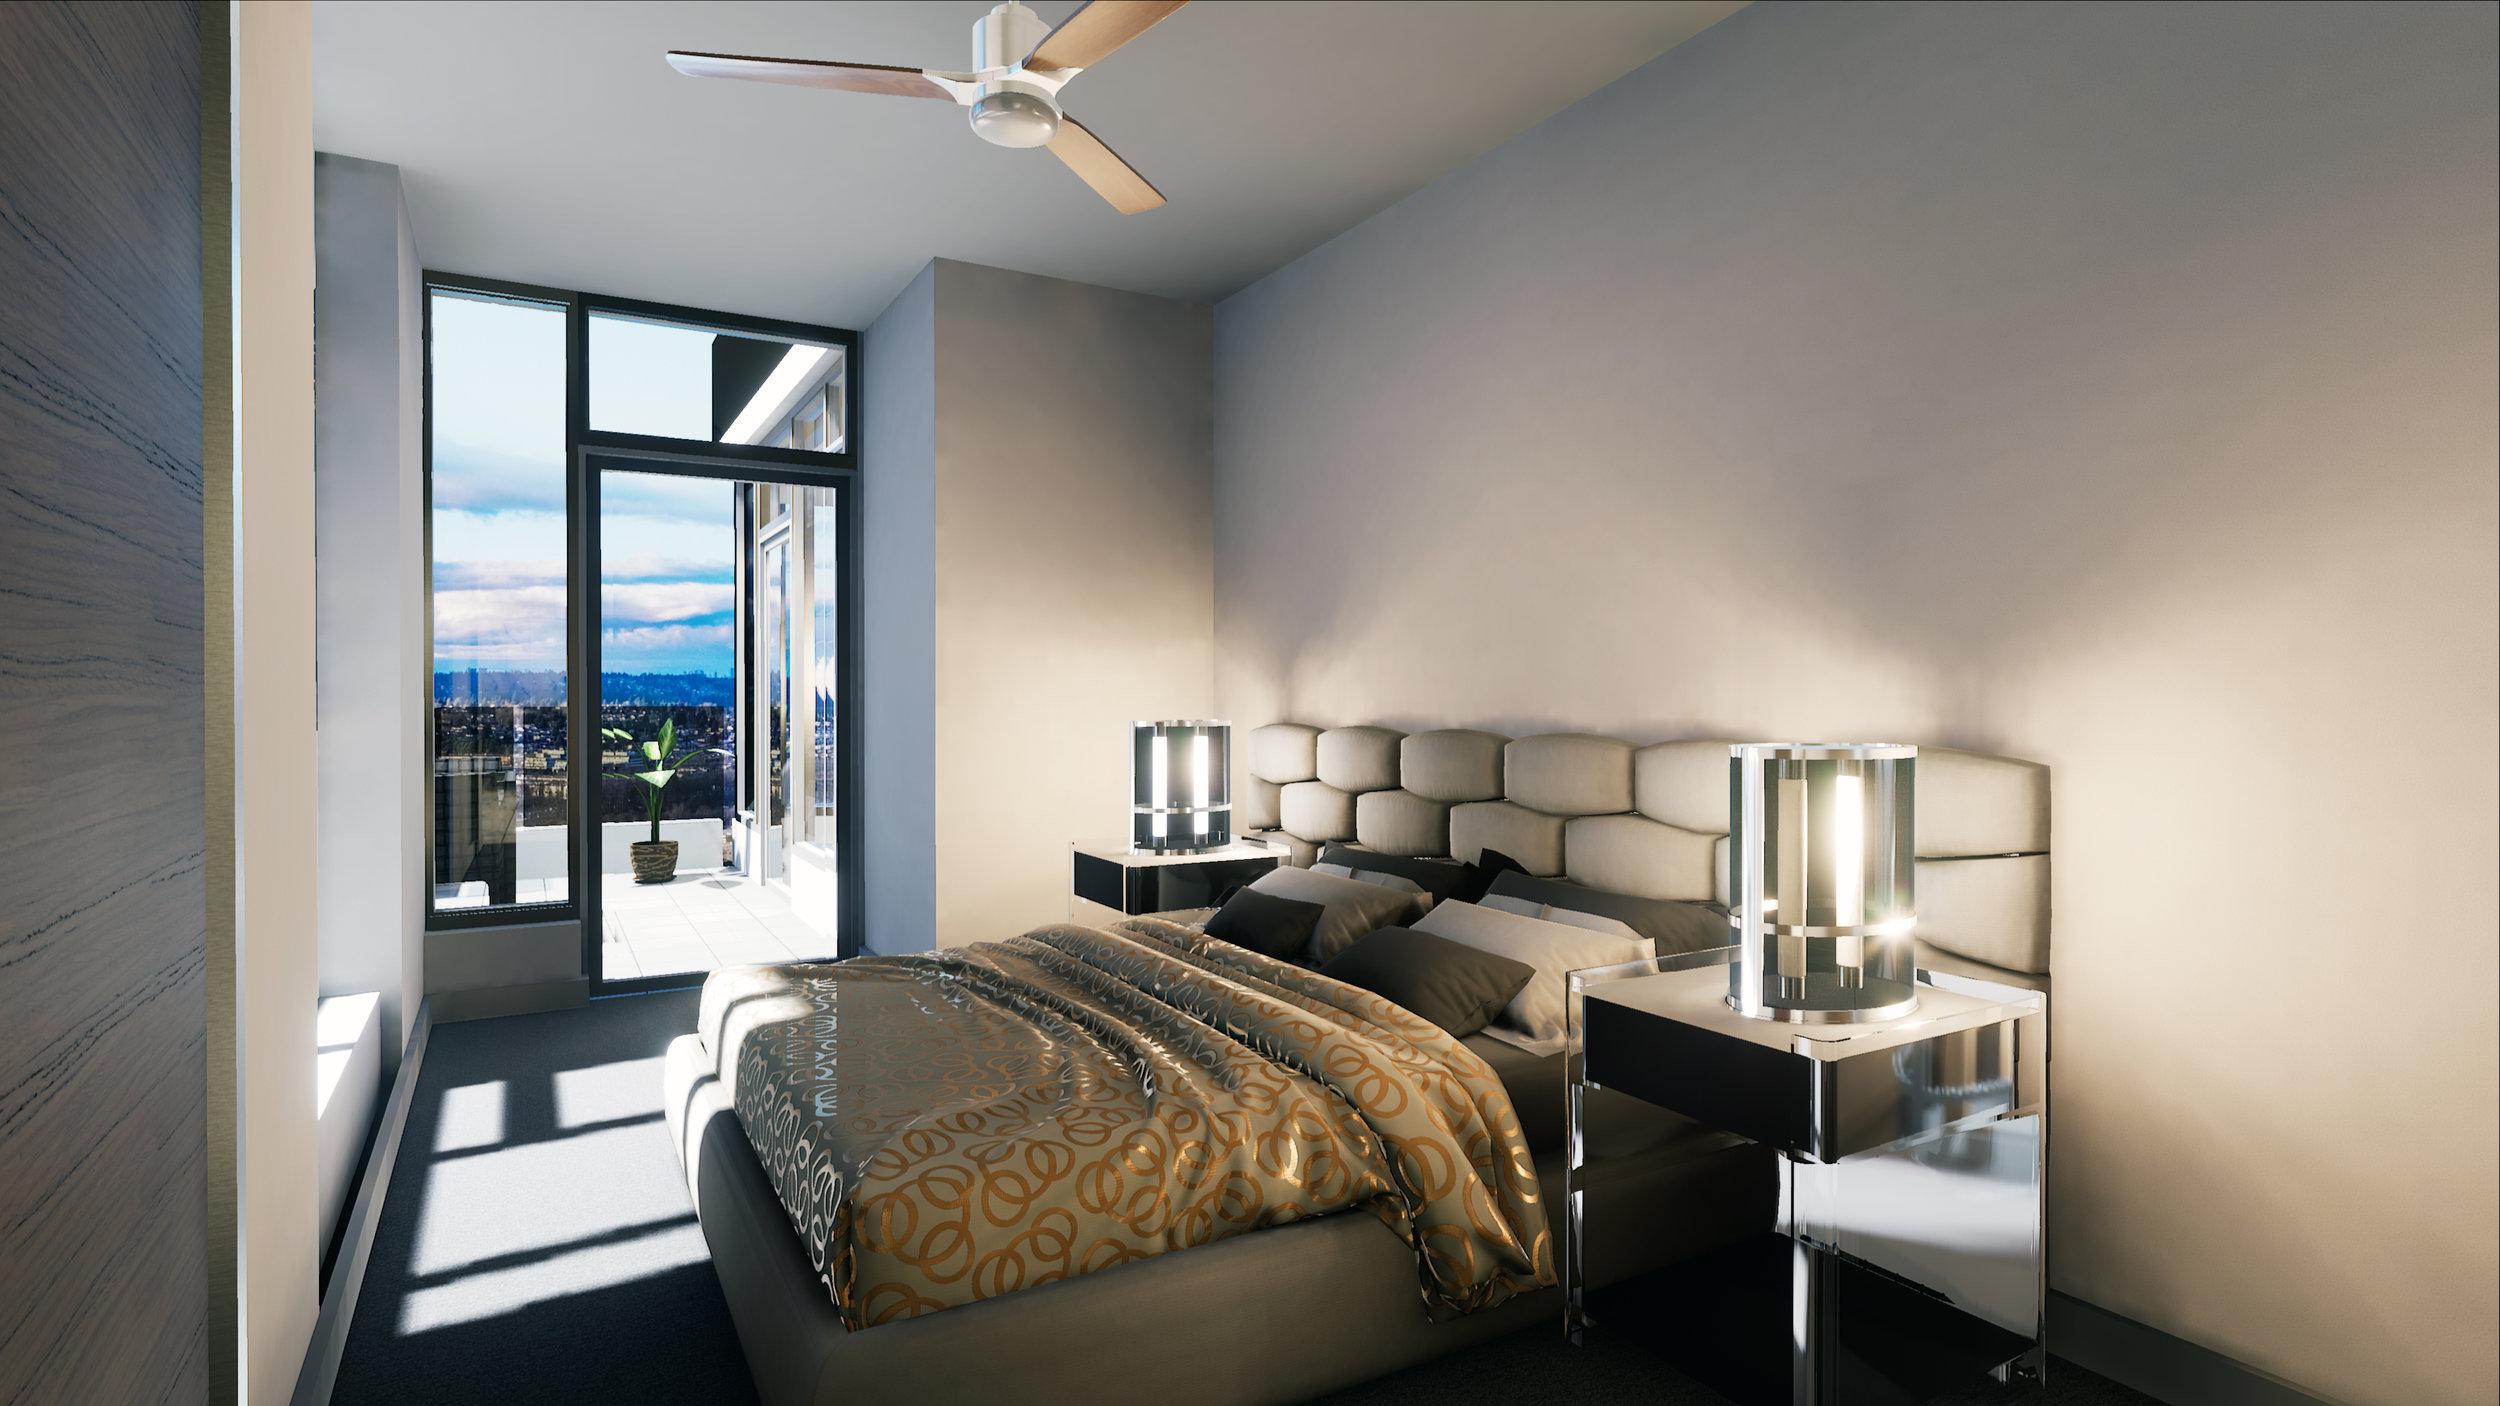 Apartment01_0004.jpg